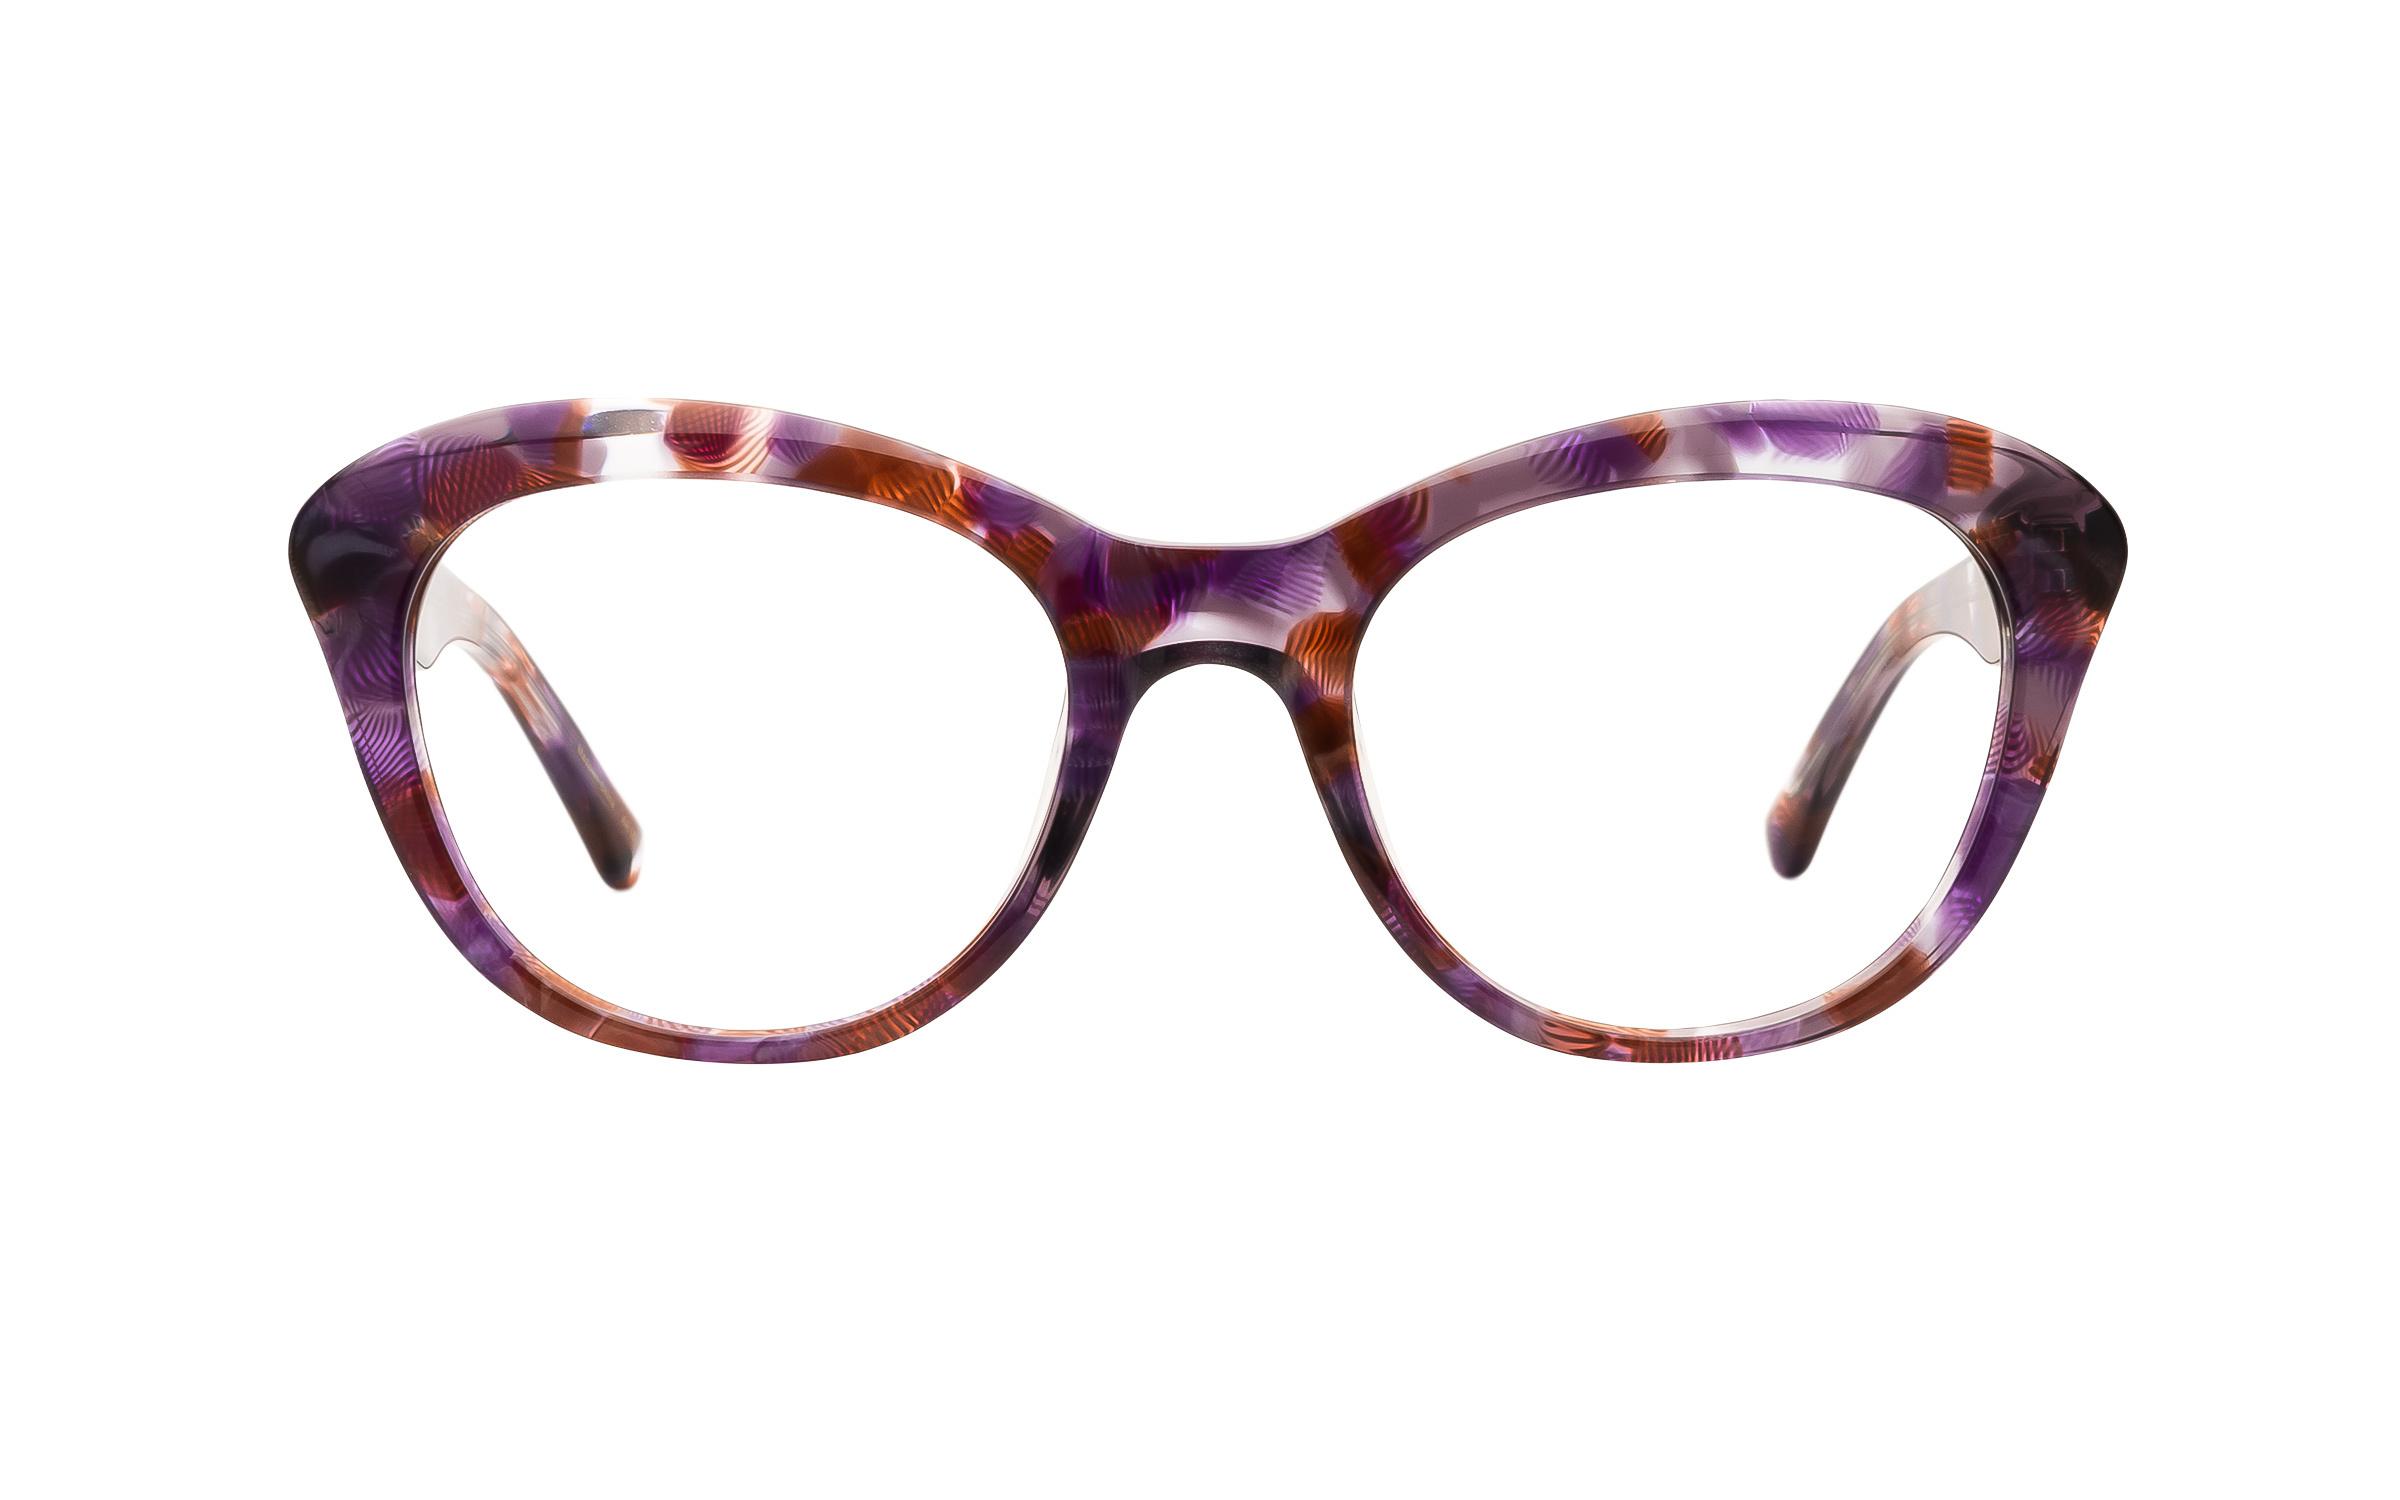 Kam_Dhillon_Womens_Glasses_CatEye_PurpleTortoise_Online_Coastal